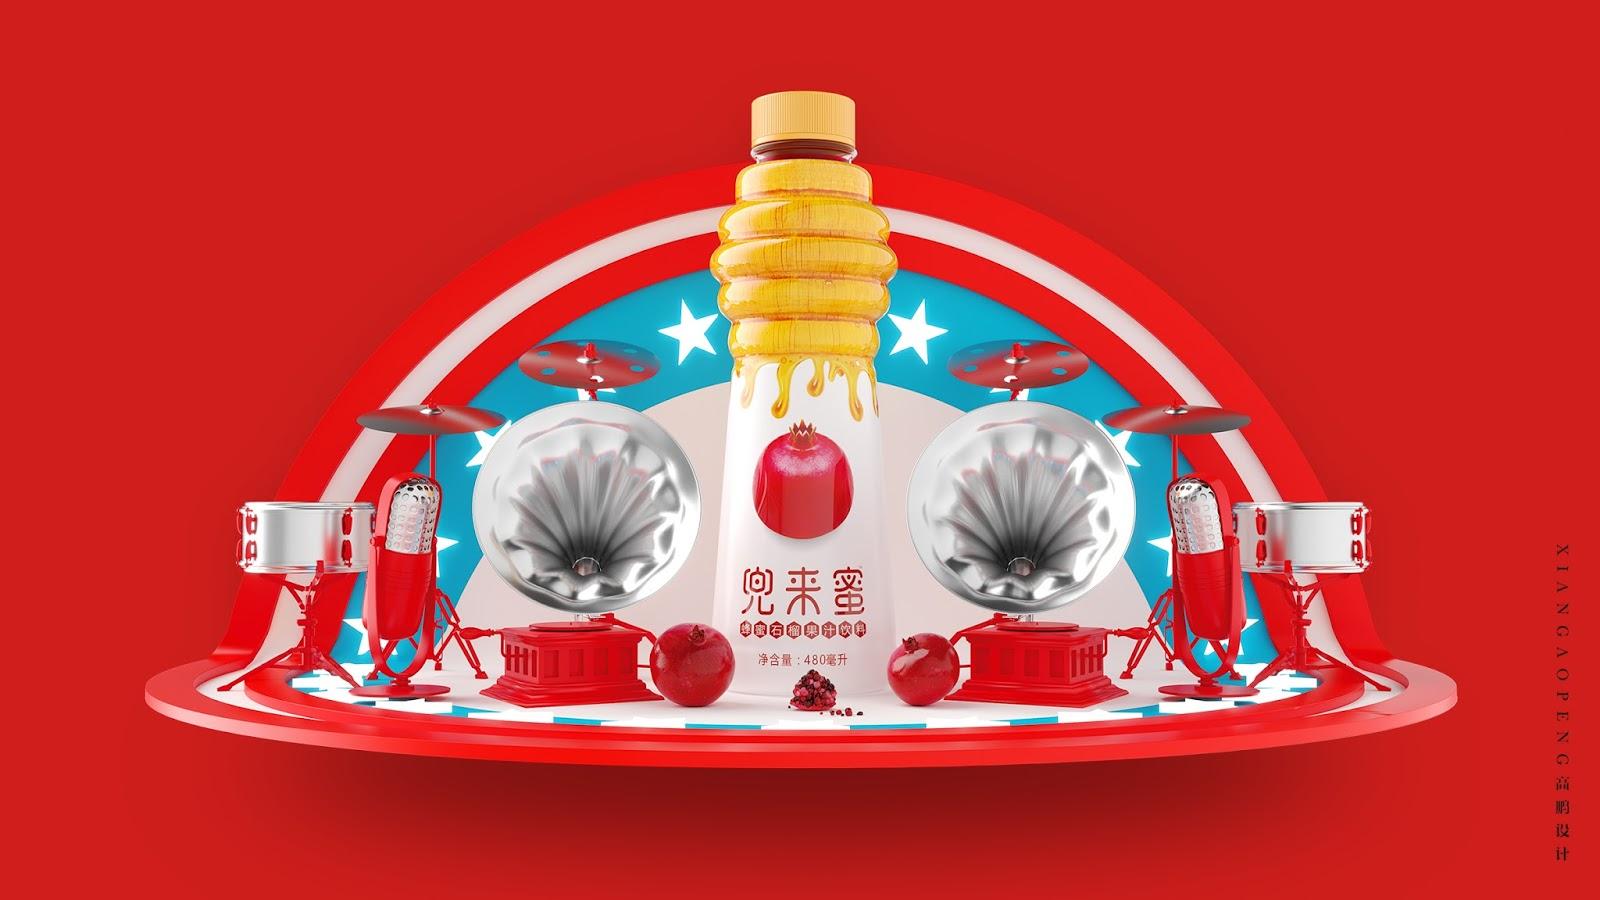 Popsop_China_21